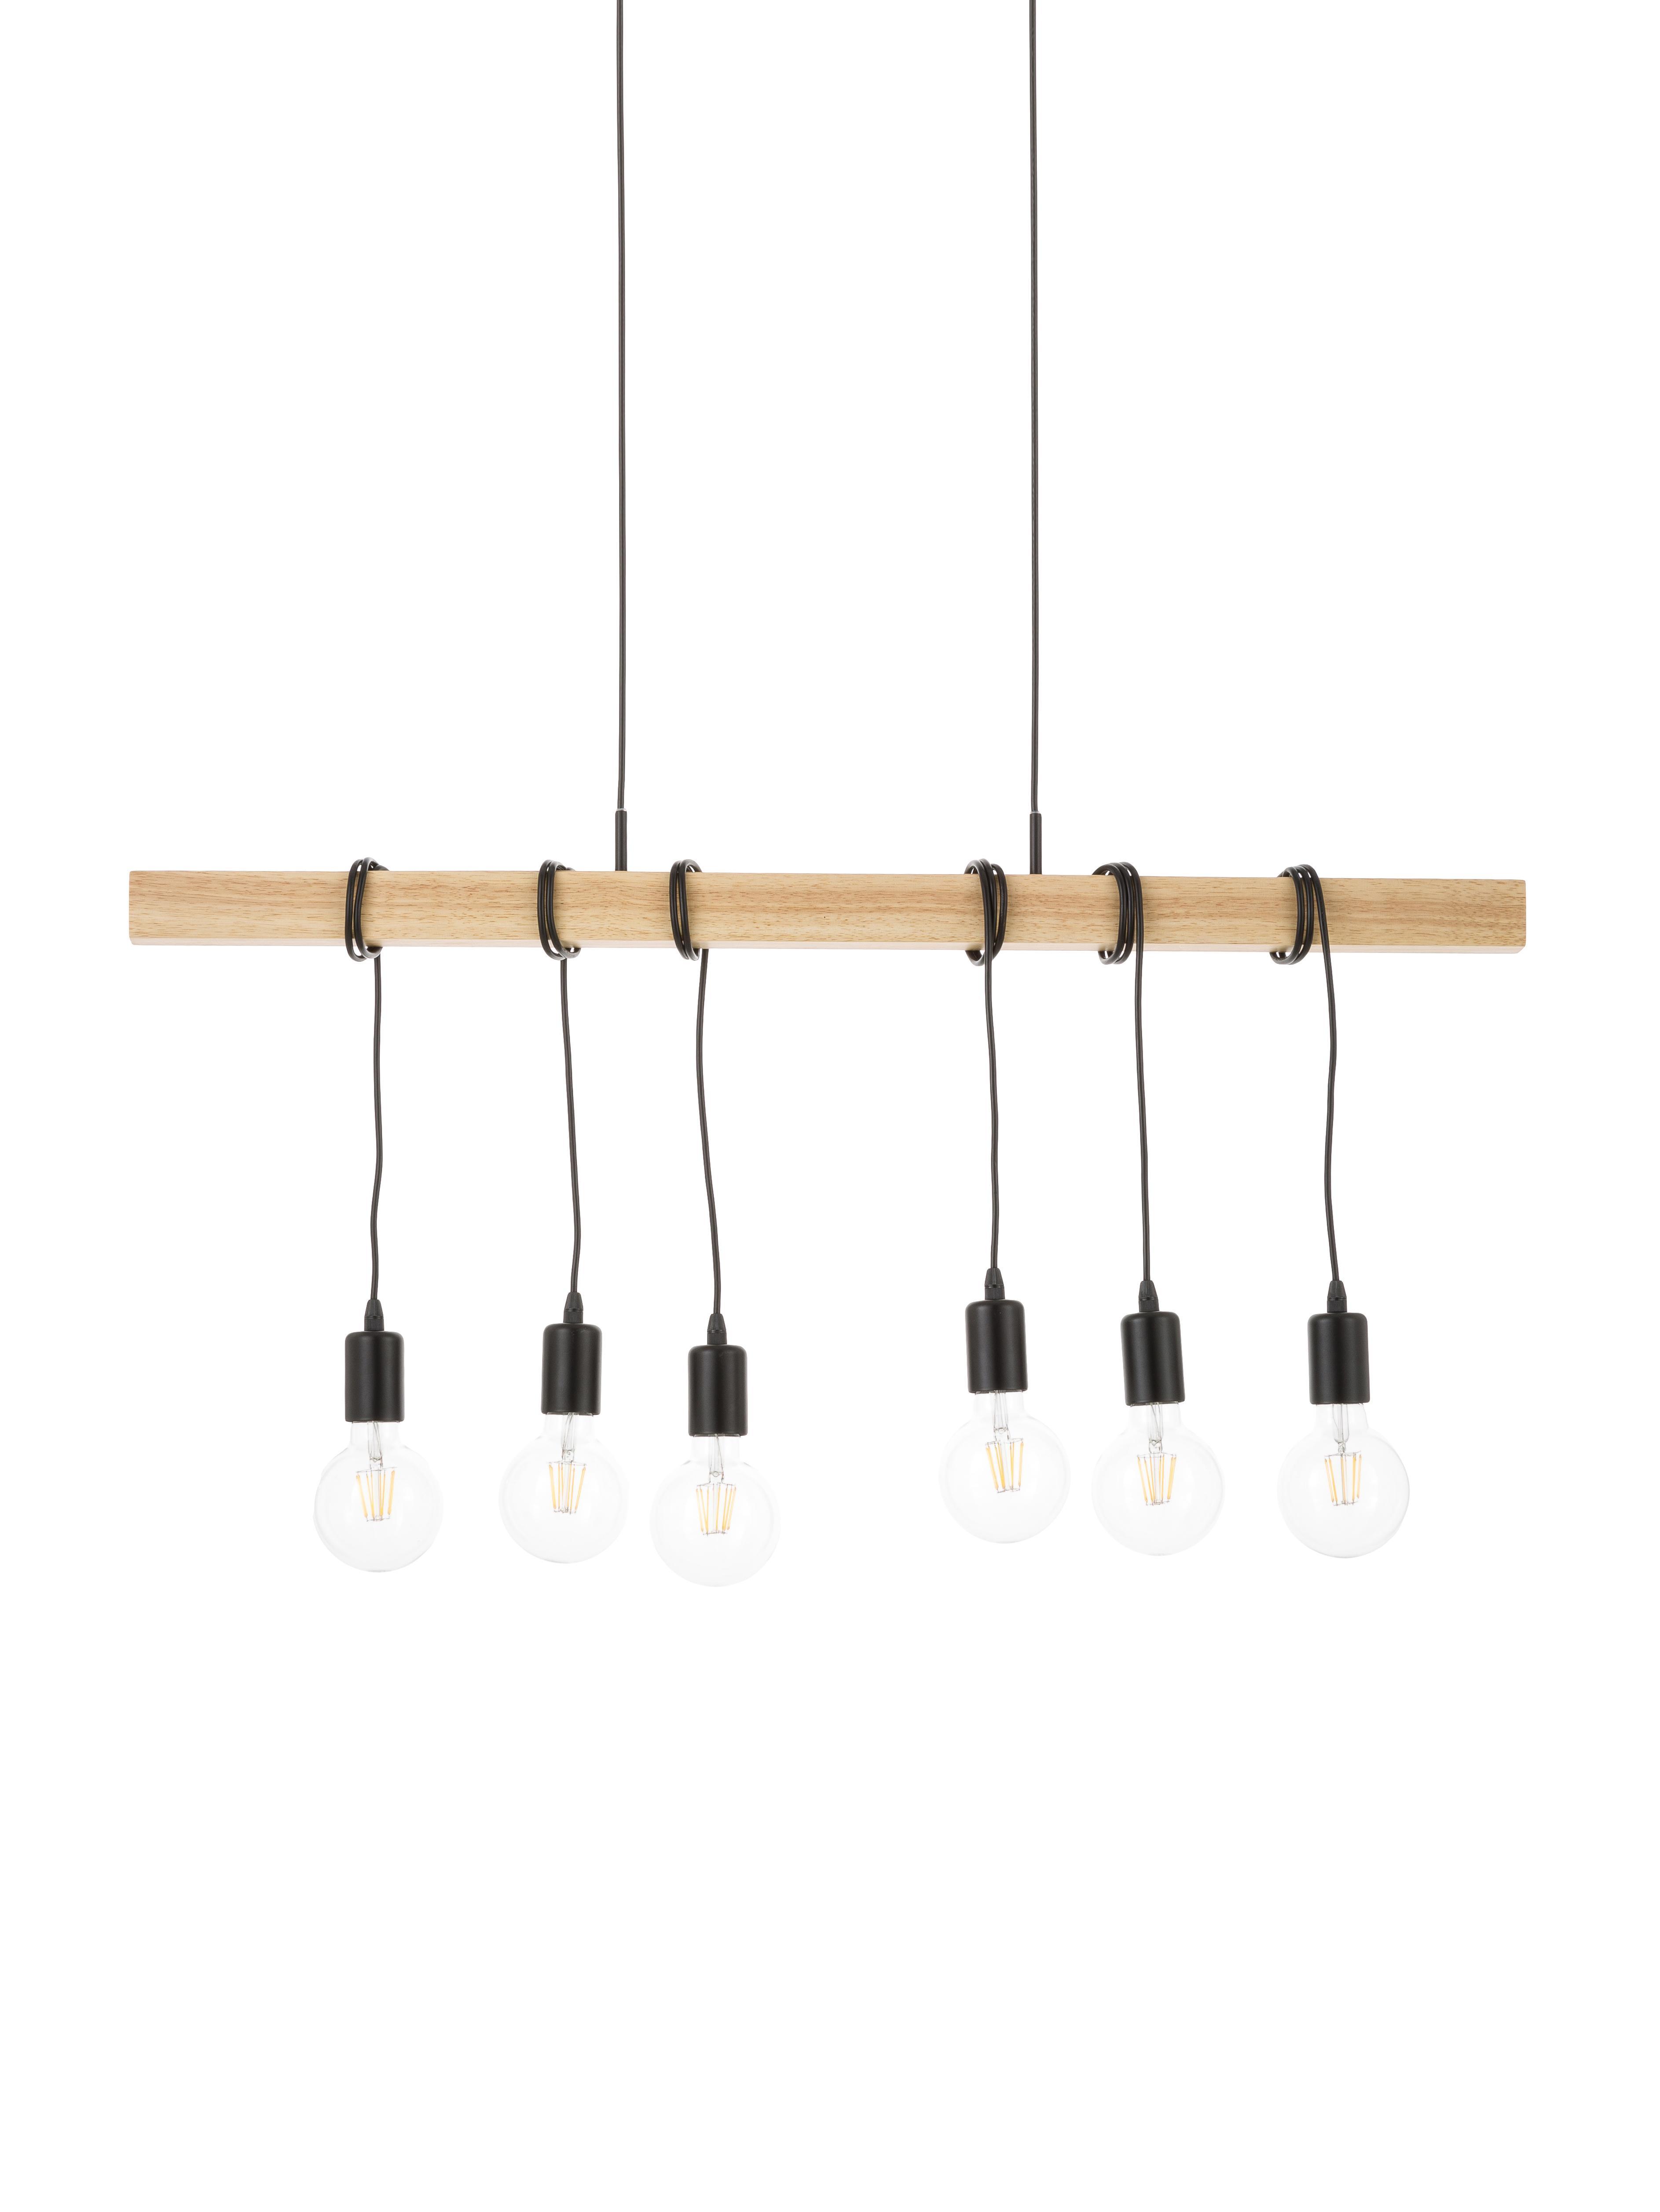 Lampada a sospensione Townshend, Nero, legno naturale, Larg. 100 x Alt. 110 cm